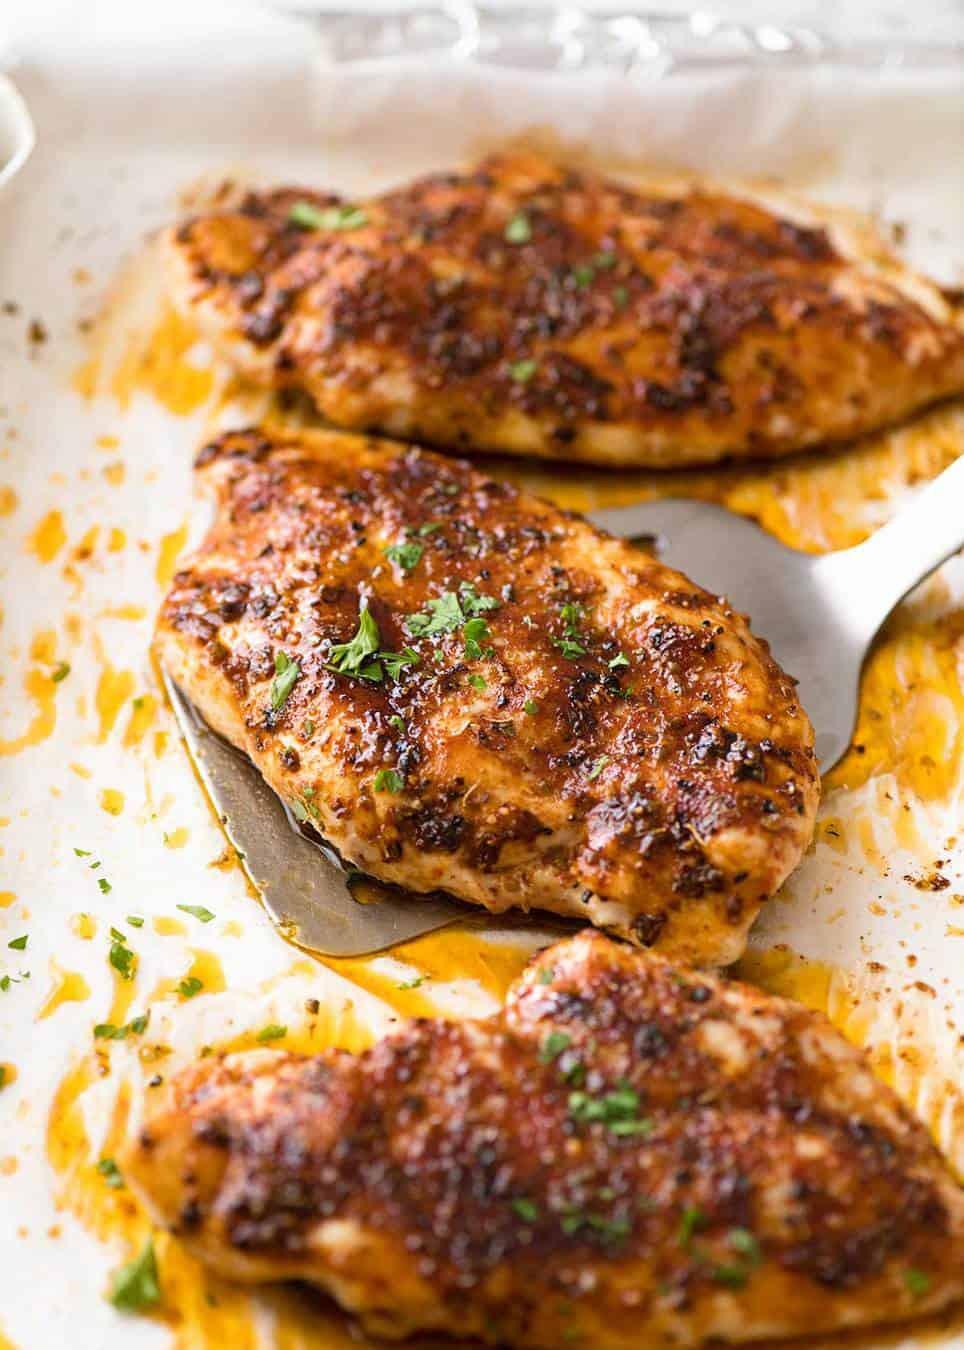 Baked Chicken Breast Recipes  Oven Baked Chicken Breast